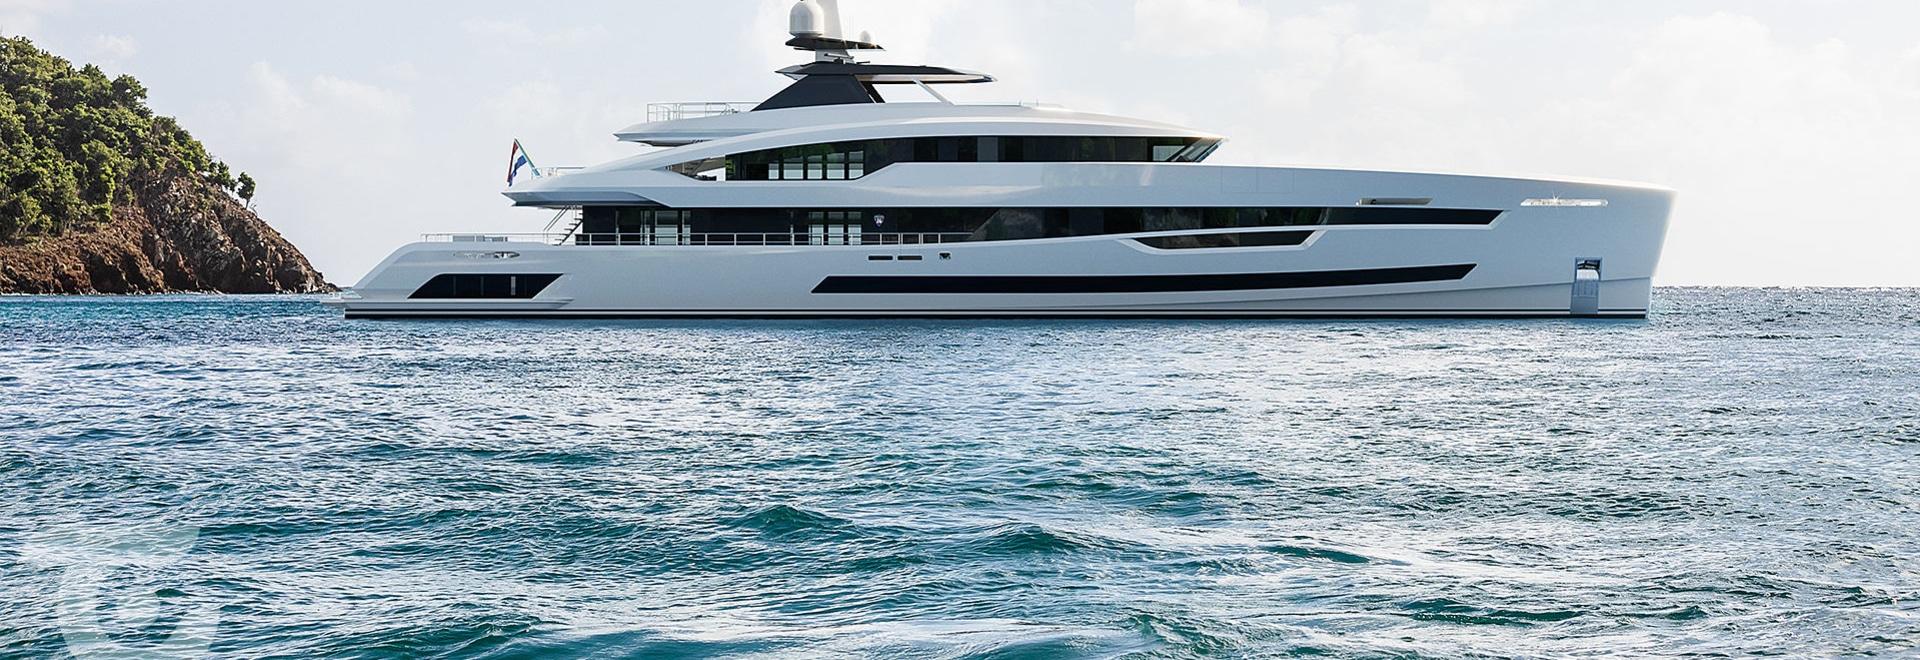 MYS 19: New 57m Heesen superyacht project revealed: Akira